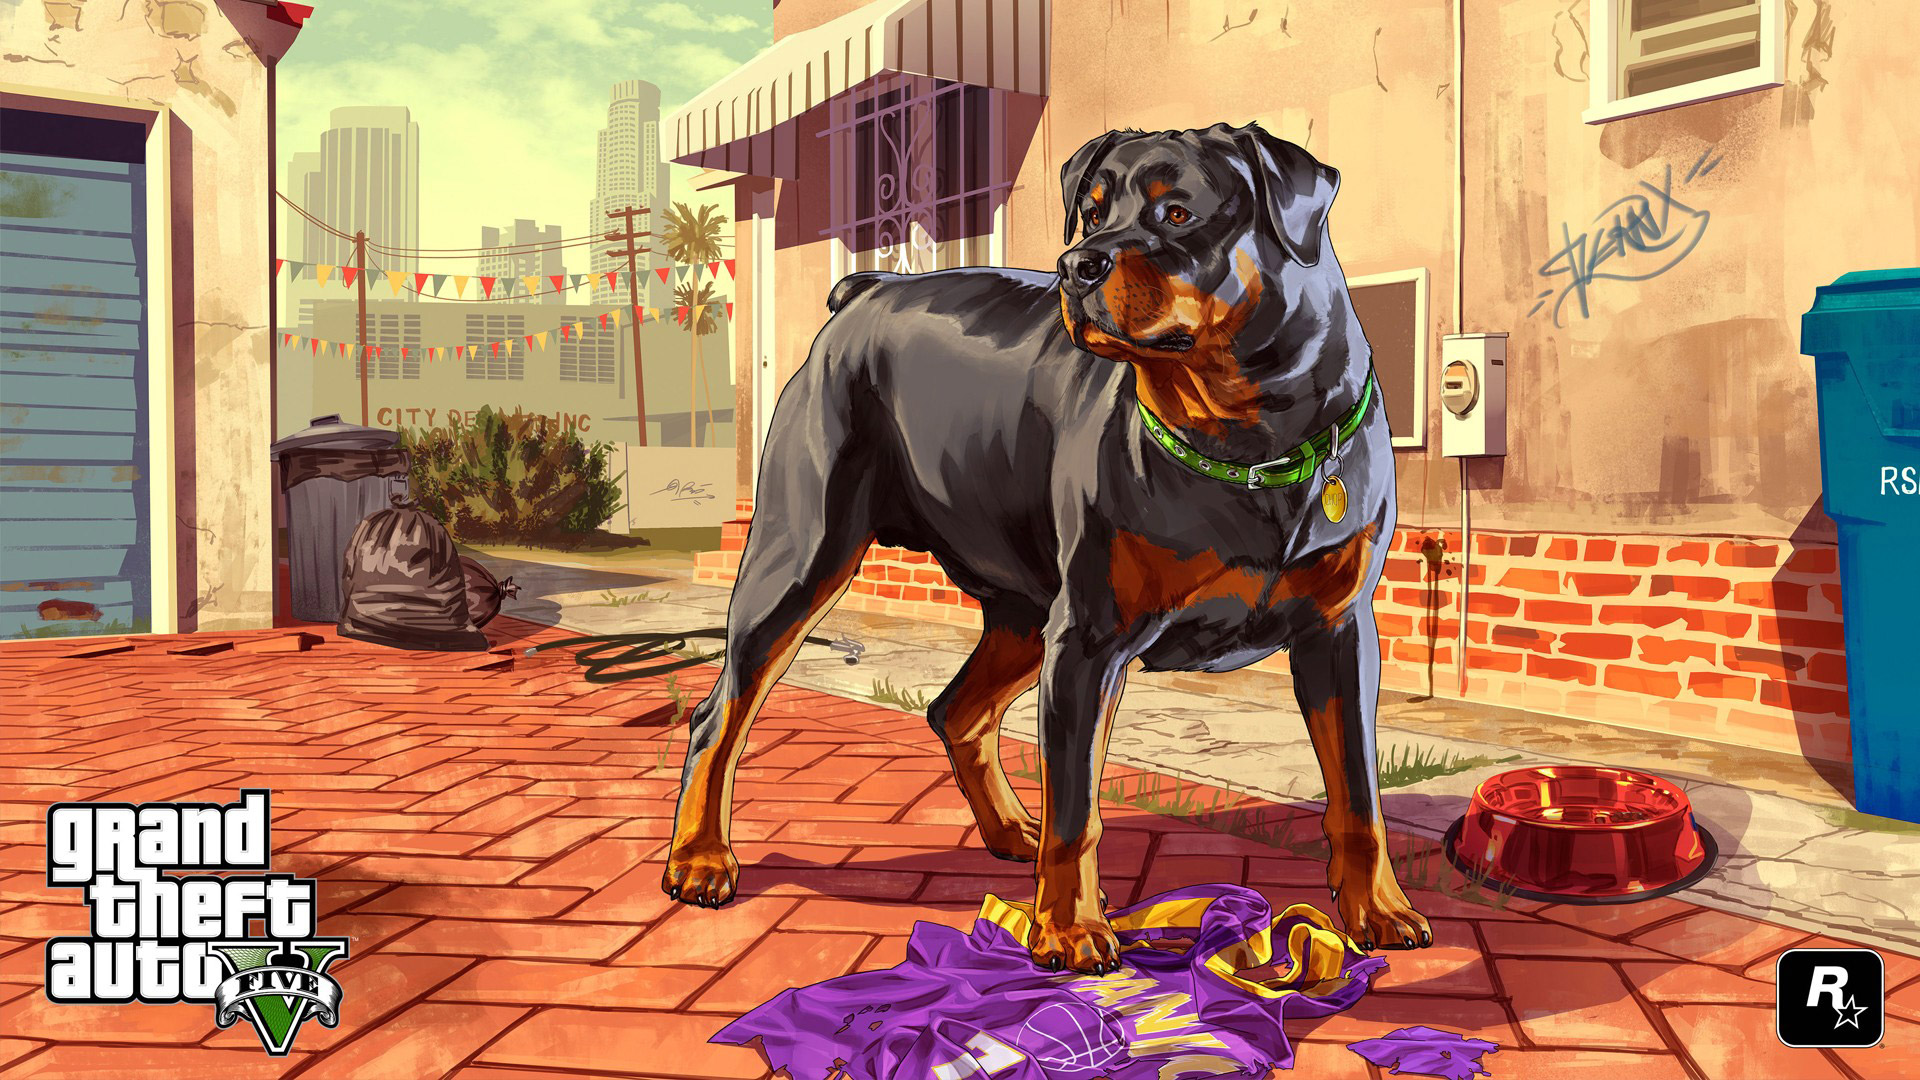 Free Grand Theft Auto V Wallpaper in 1920x1080